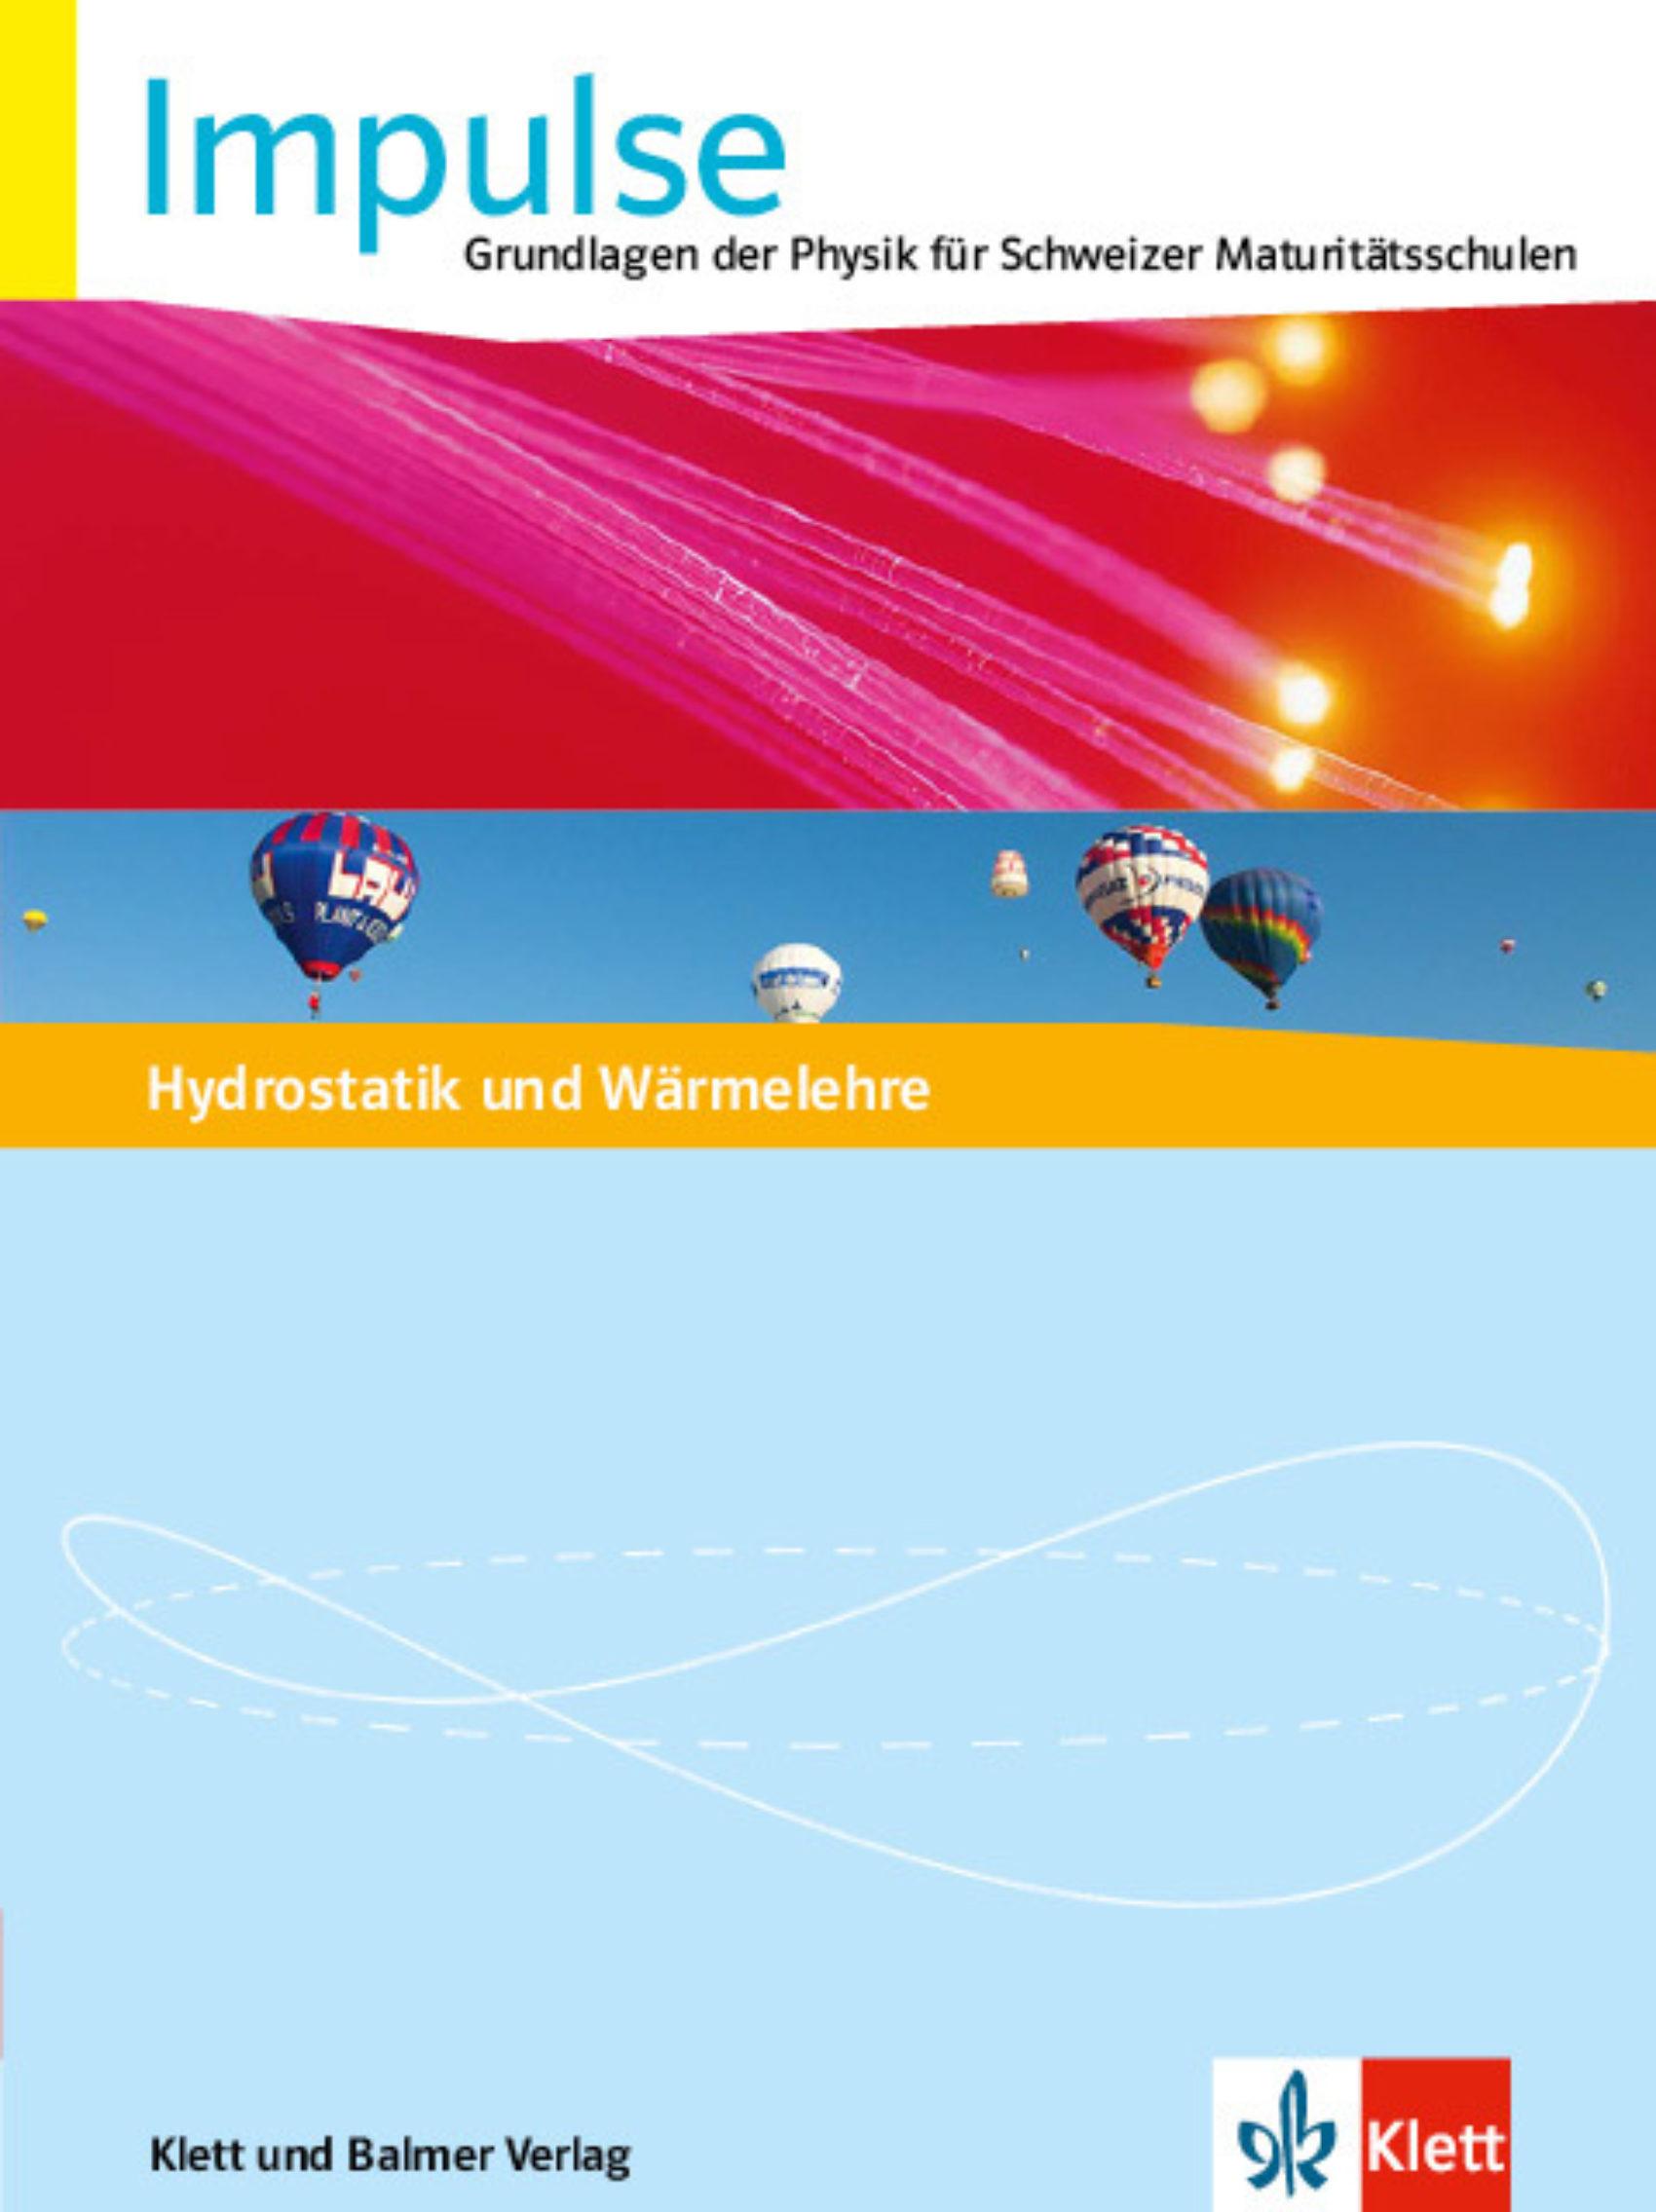 Themenheft impulse hydrostatik 978 3 264 84551 8 klett und balmer